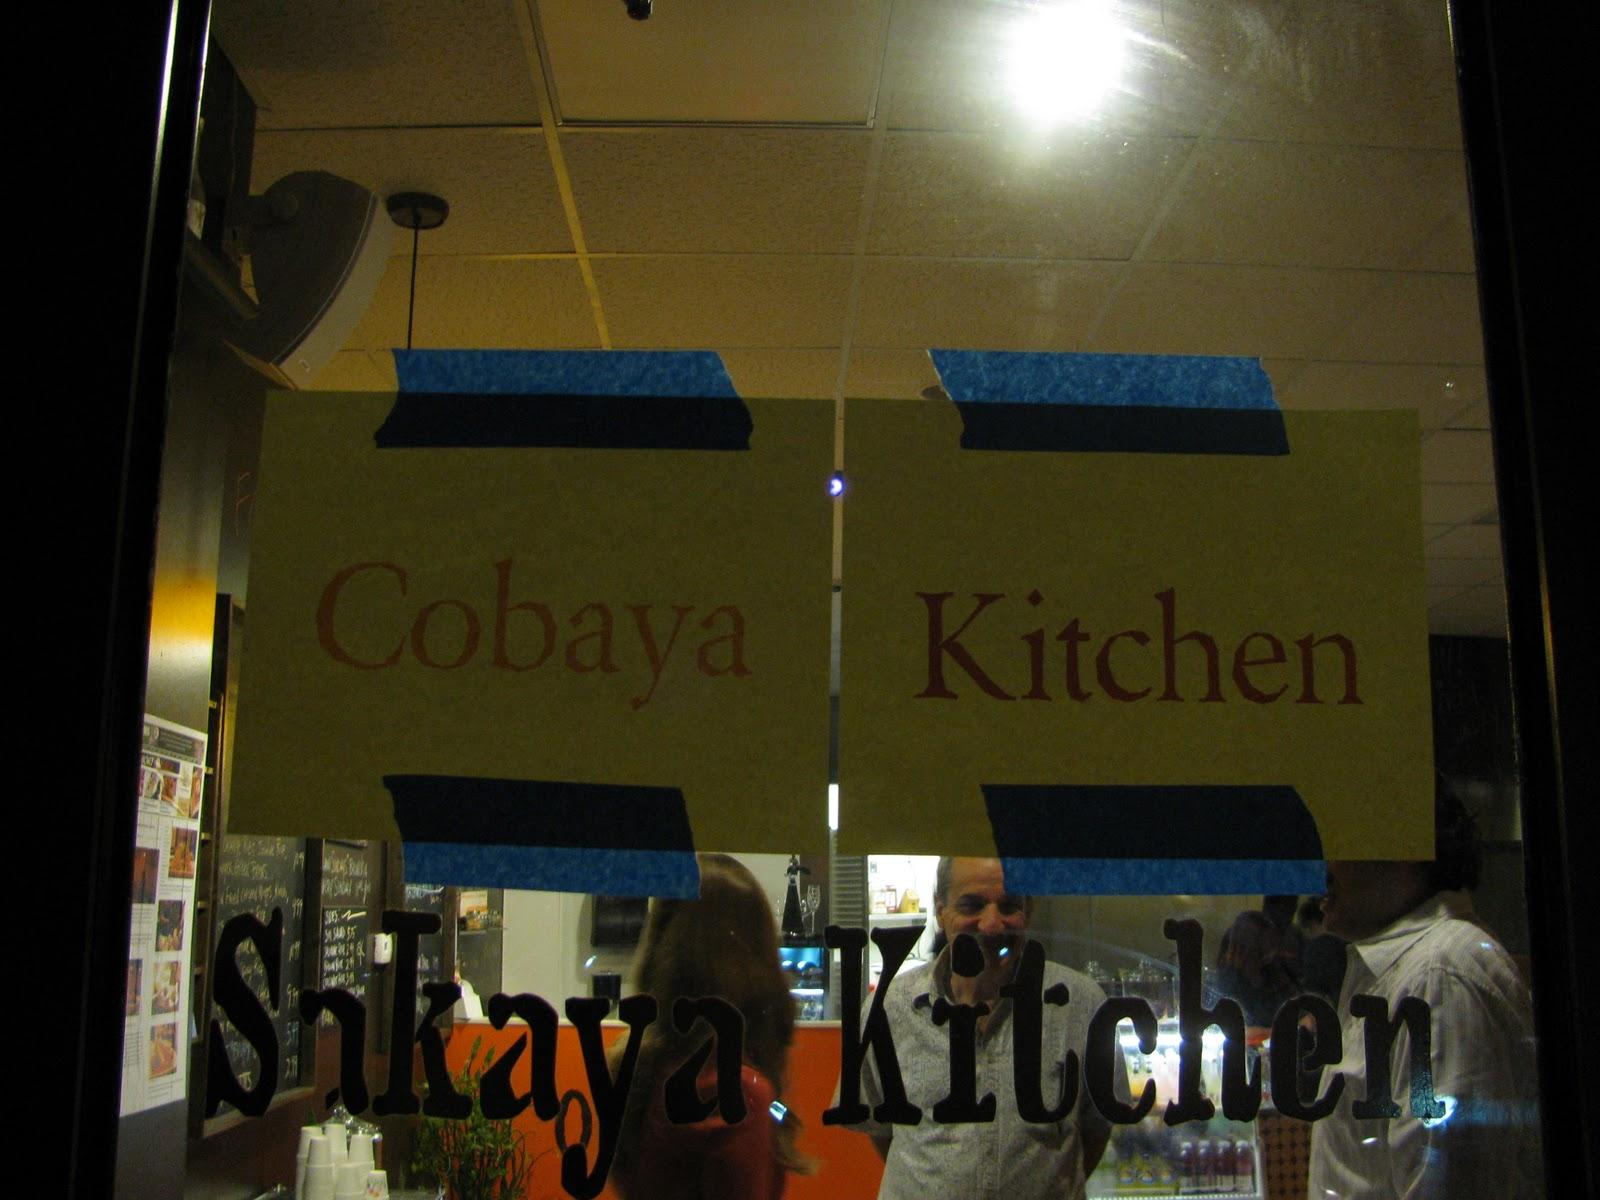 Cobaya Kitchen